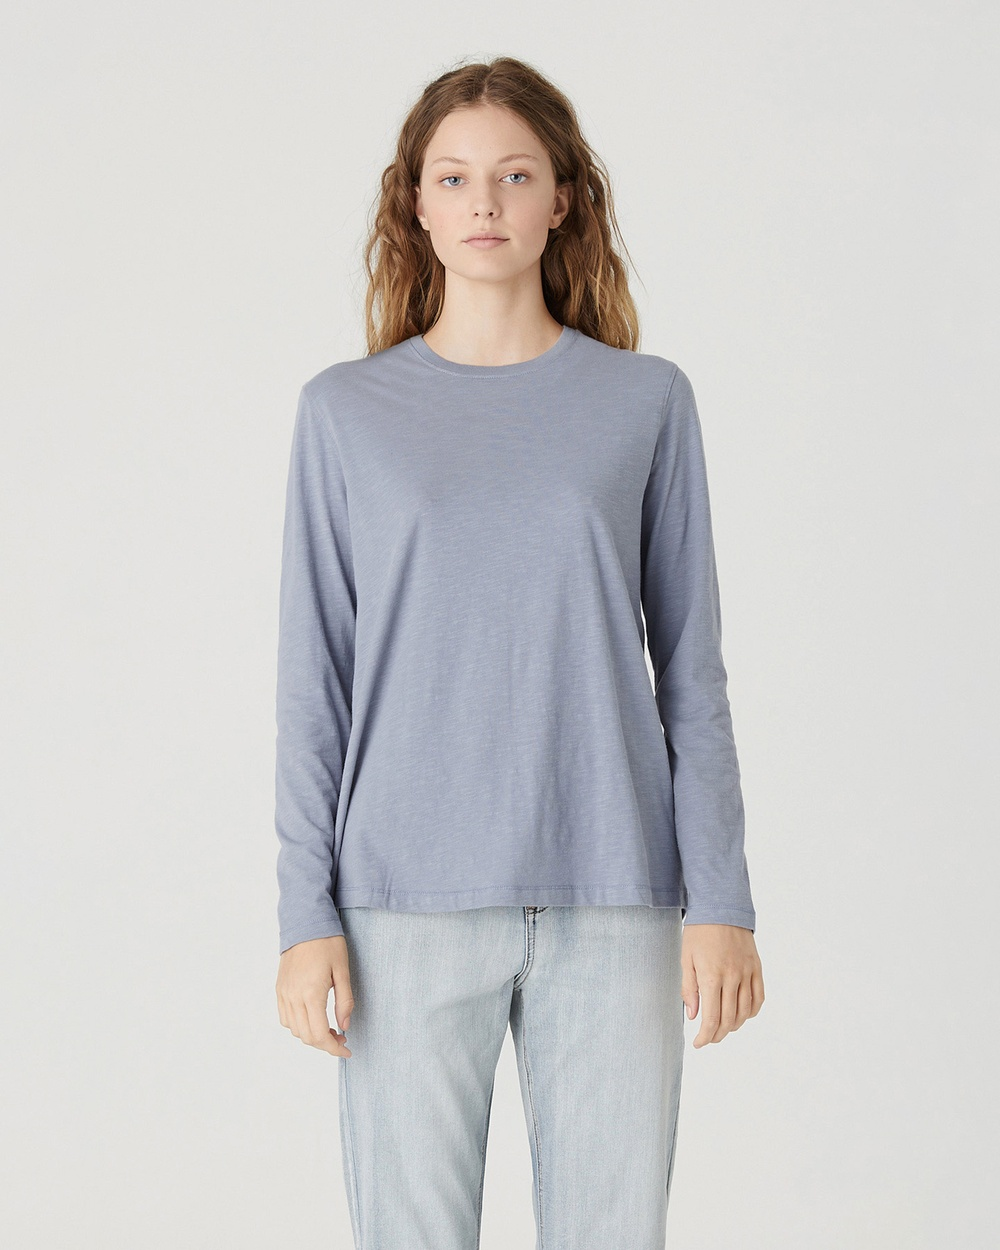 Jac & Mooki - Charlie Long Sleeve Tee - Long Sleeve T-Shirts (POWDER BLUE) Charlie Long Sleeve Tee